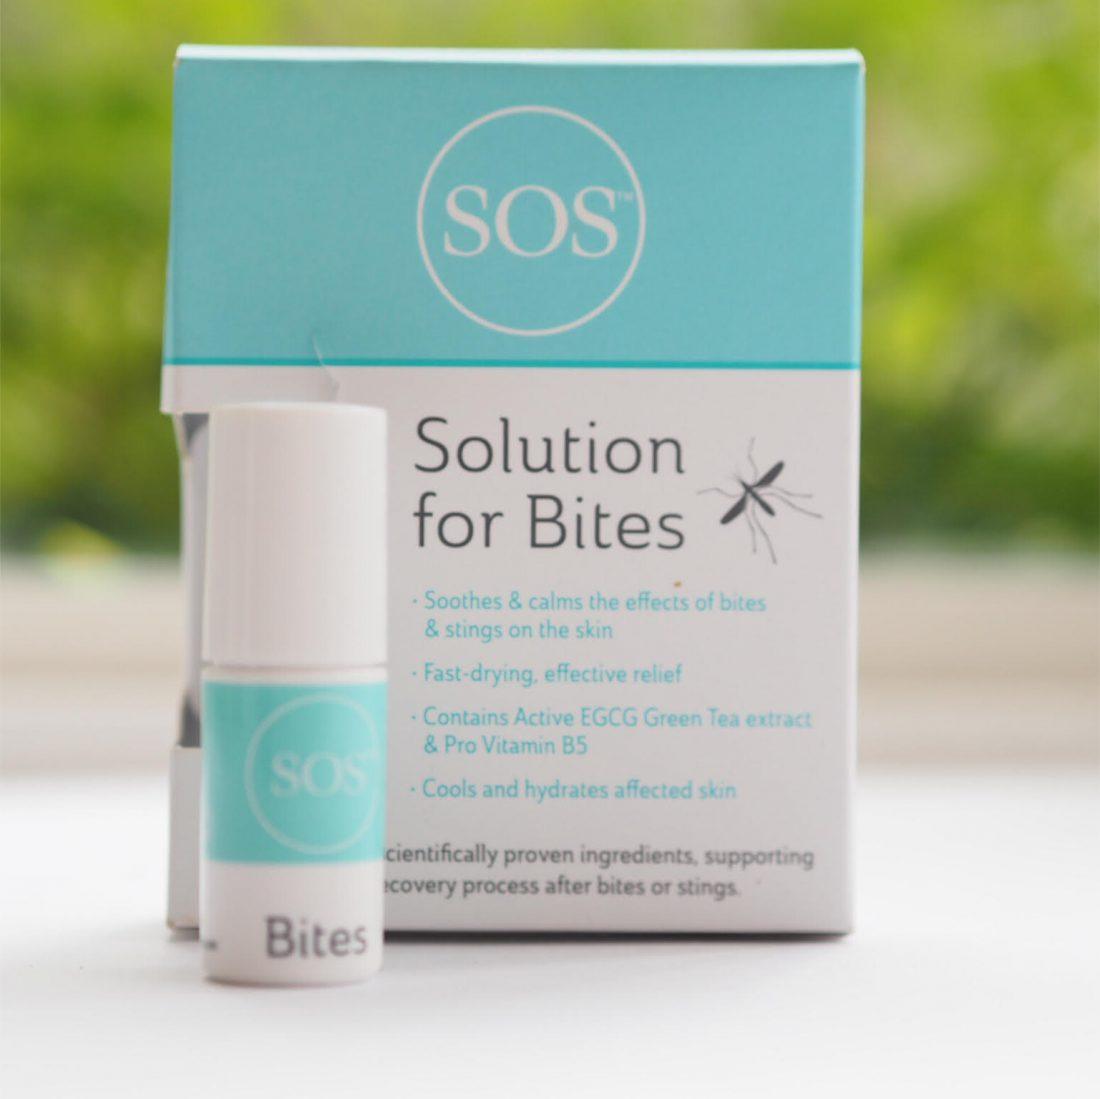 SOS Solution For Bites